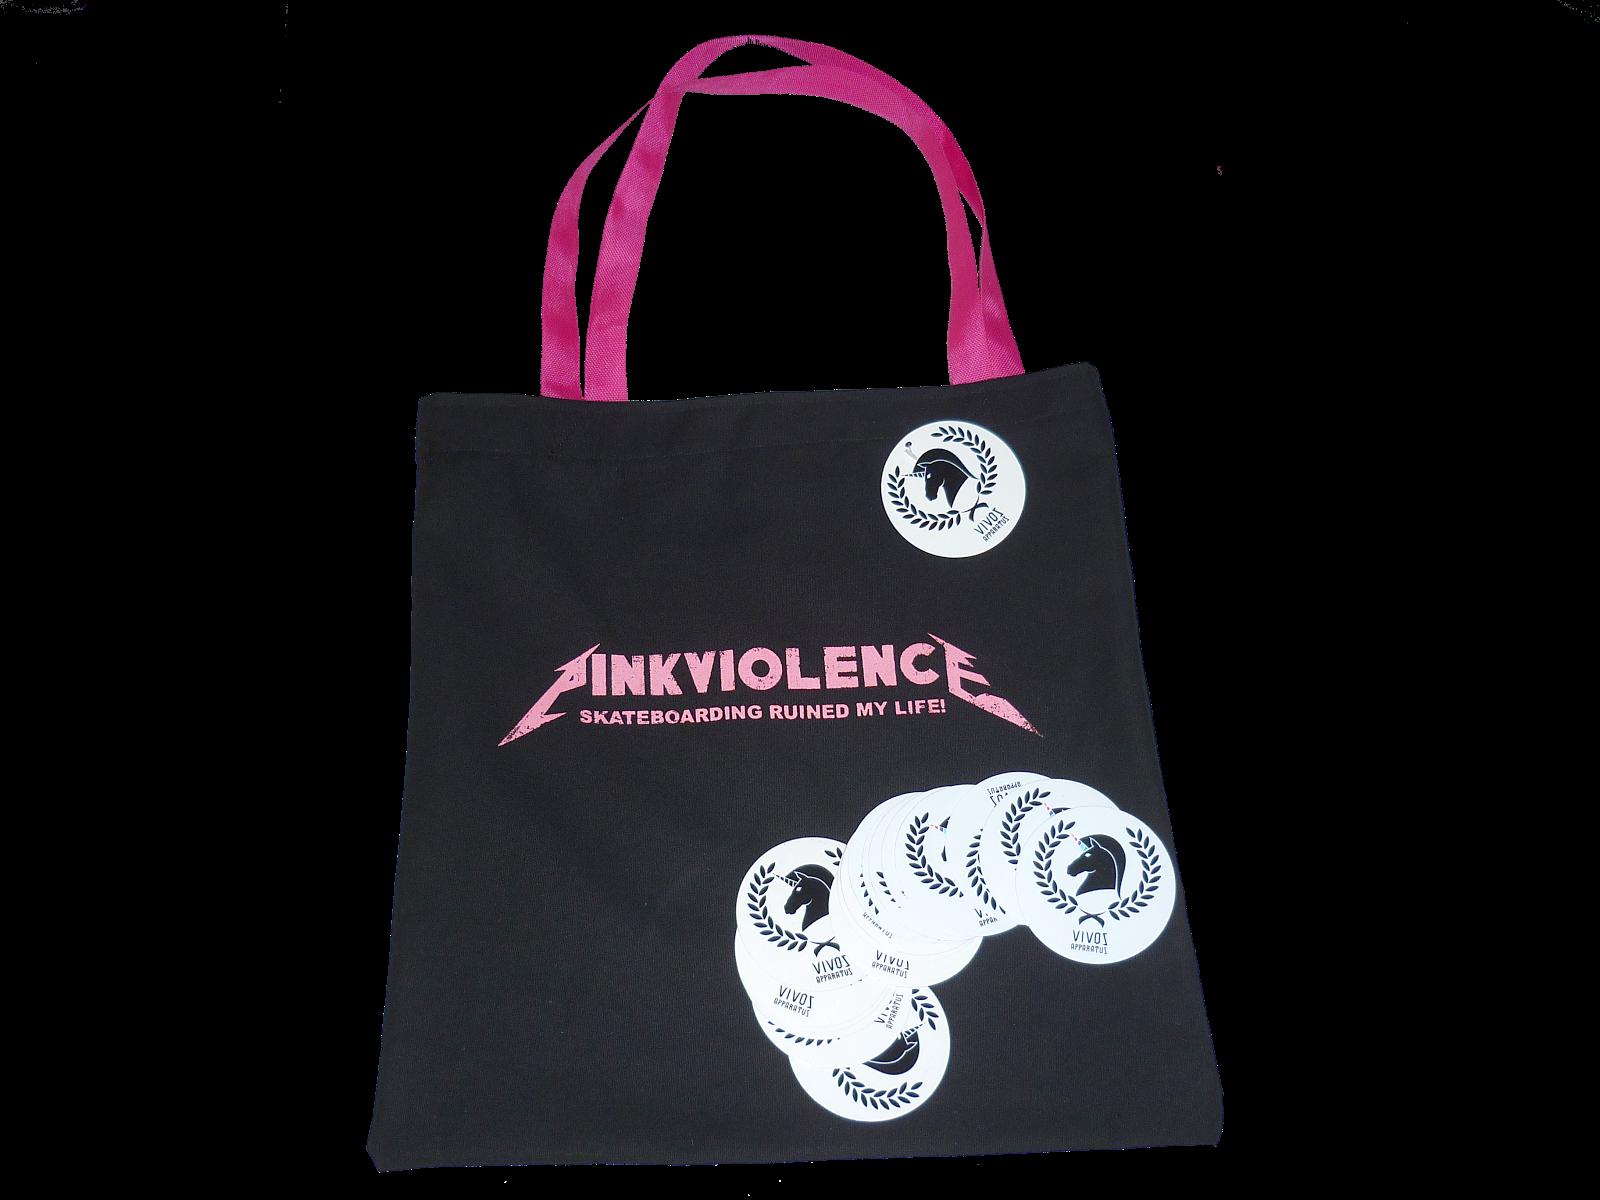 vivos apparatus x ironxhanger x pinkviolence ©